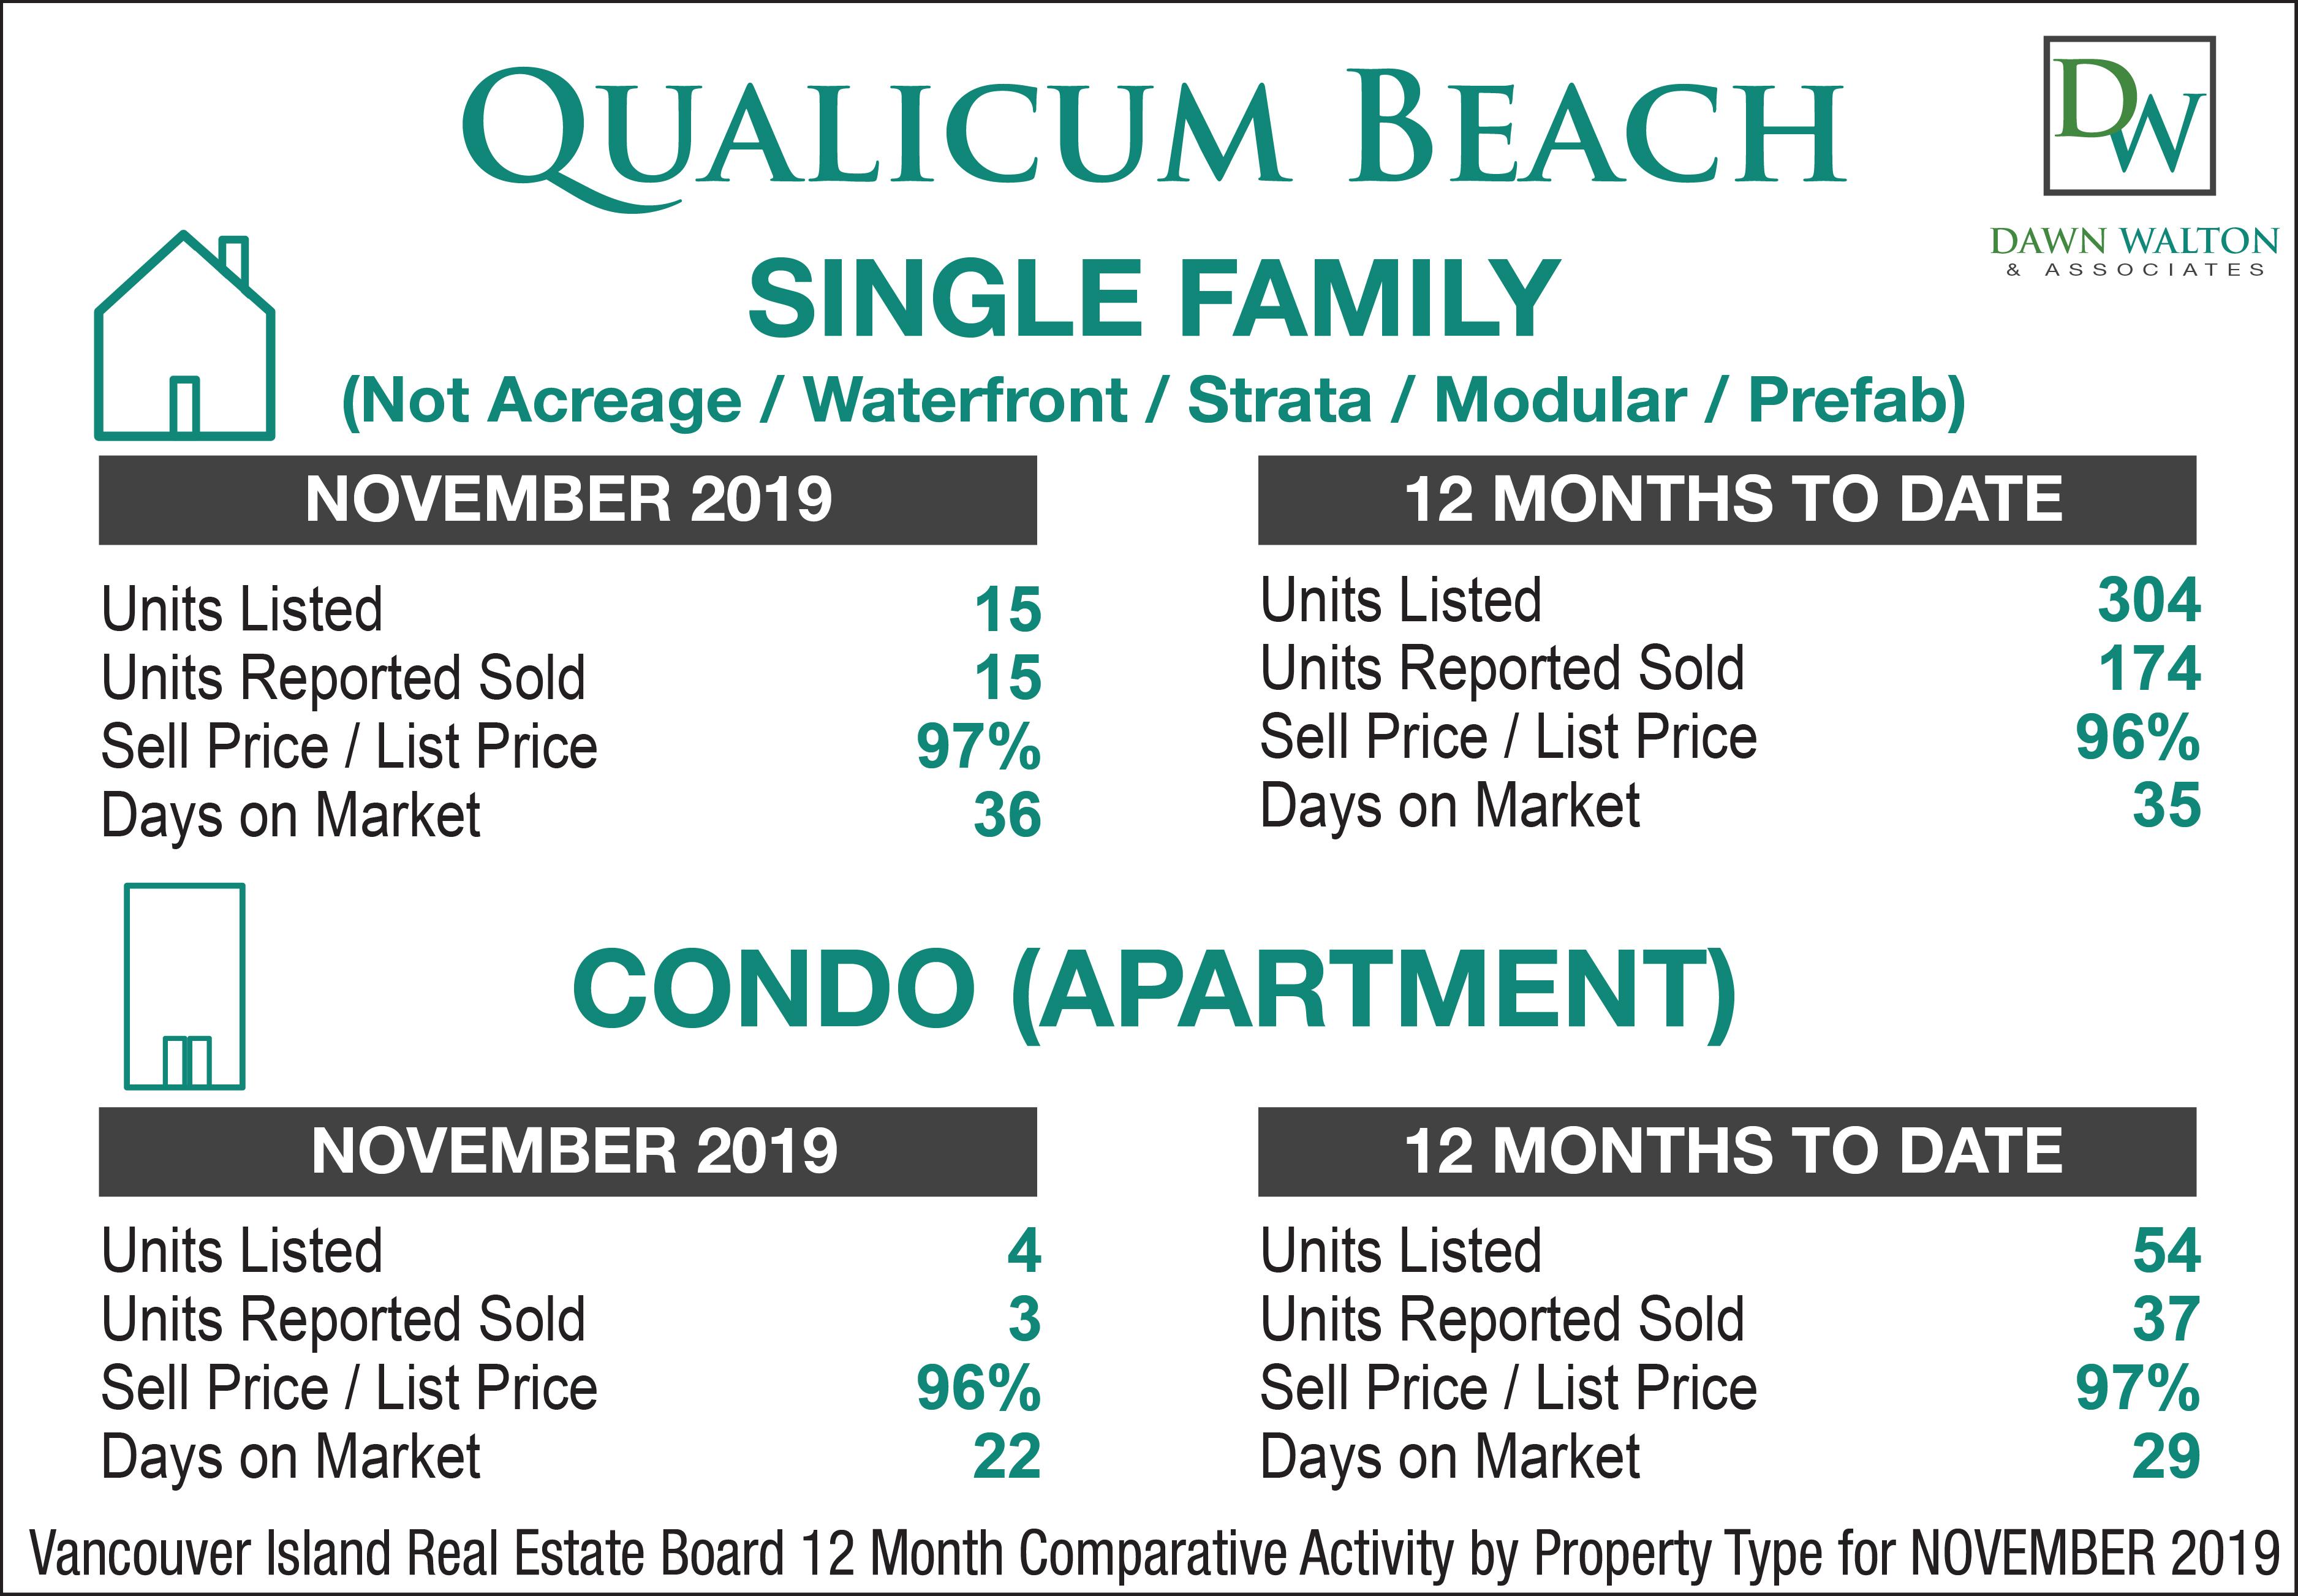 Qualicum Beach Real Estate Market Stats November  2019 - Nanaimo Realtor Dawn Walton